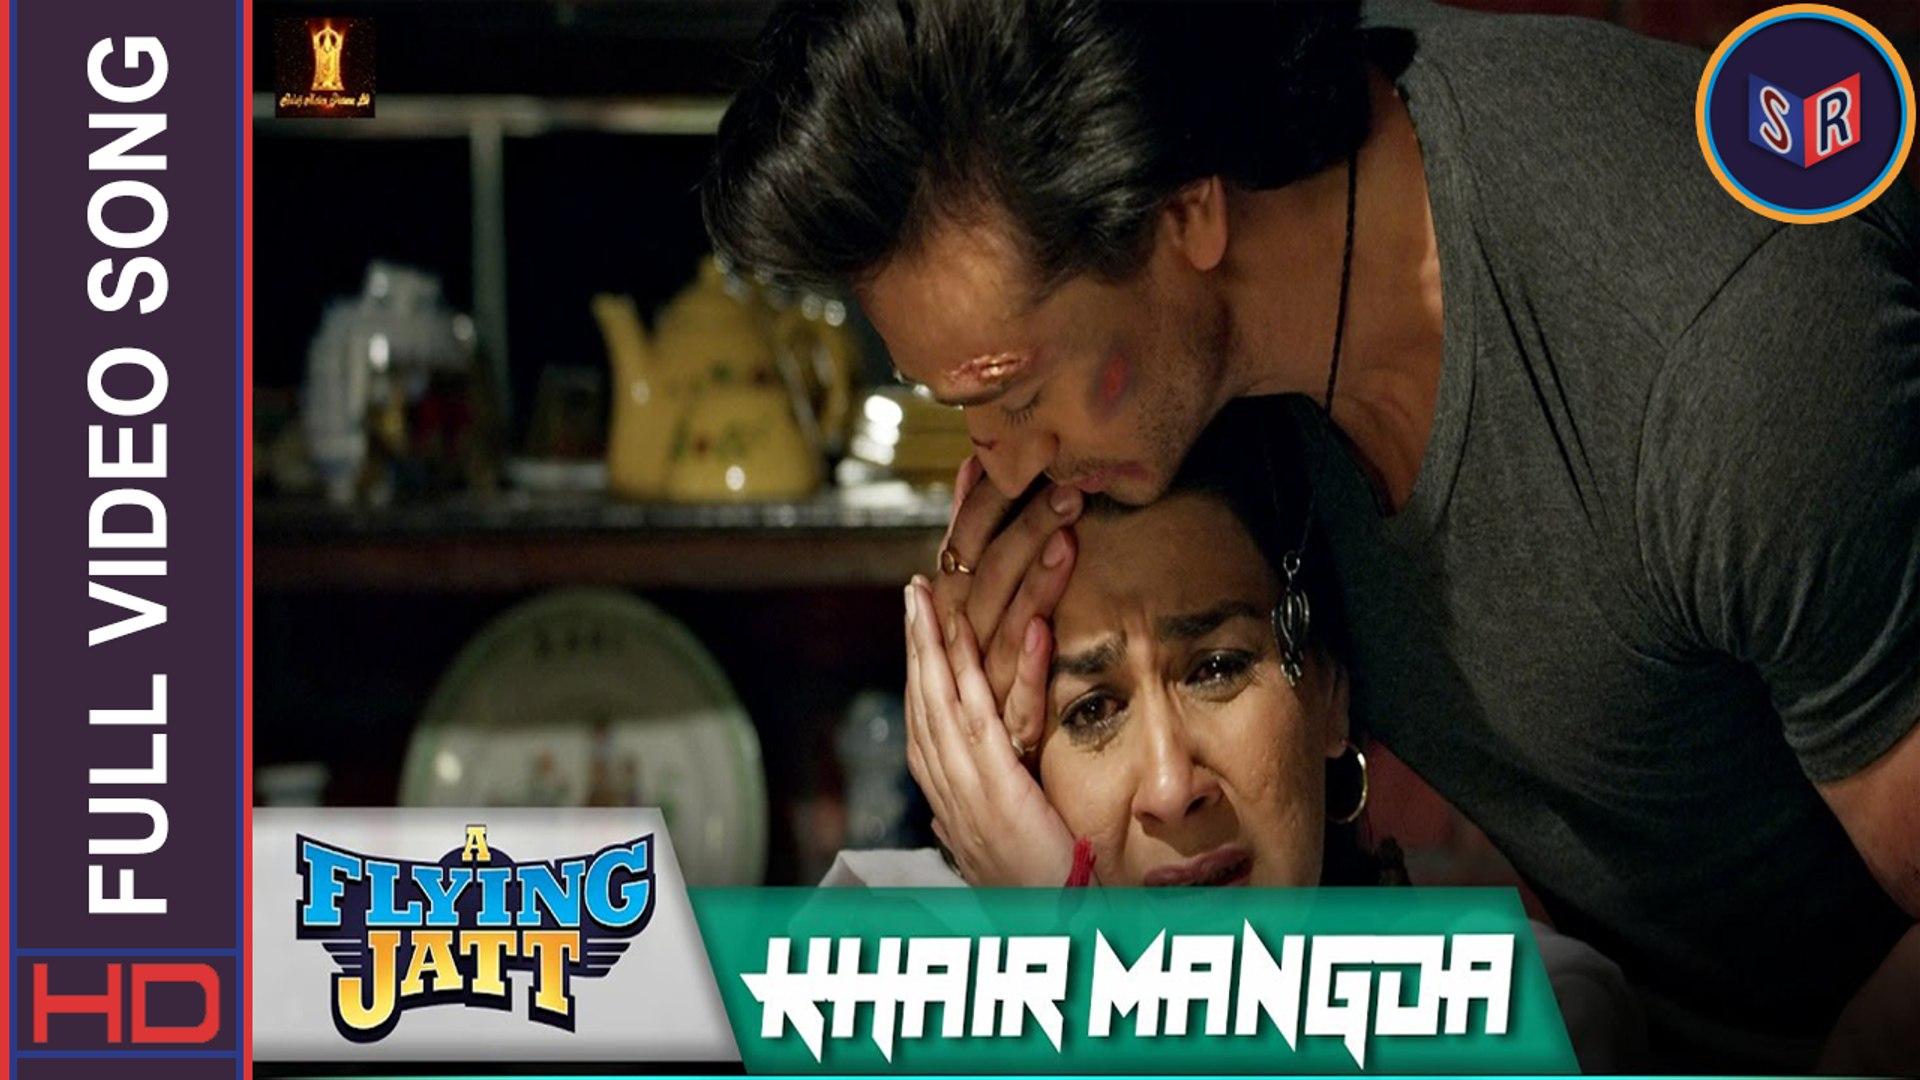 Khair Mangda - [Title Track] [Full Video Song] – A Flying Jatt [2016] Song  By Atif Aslam FT  Tiger Shroff & Jacqueline Fernandez [FULL HD]